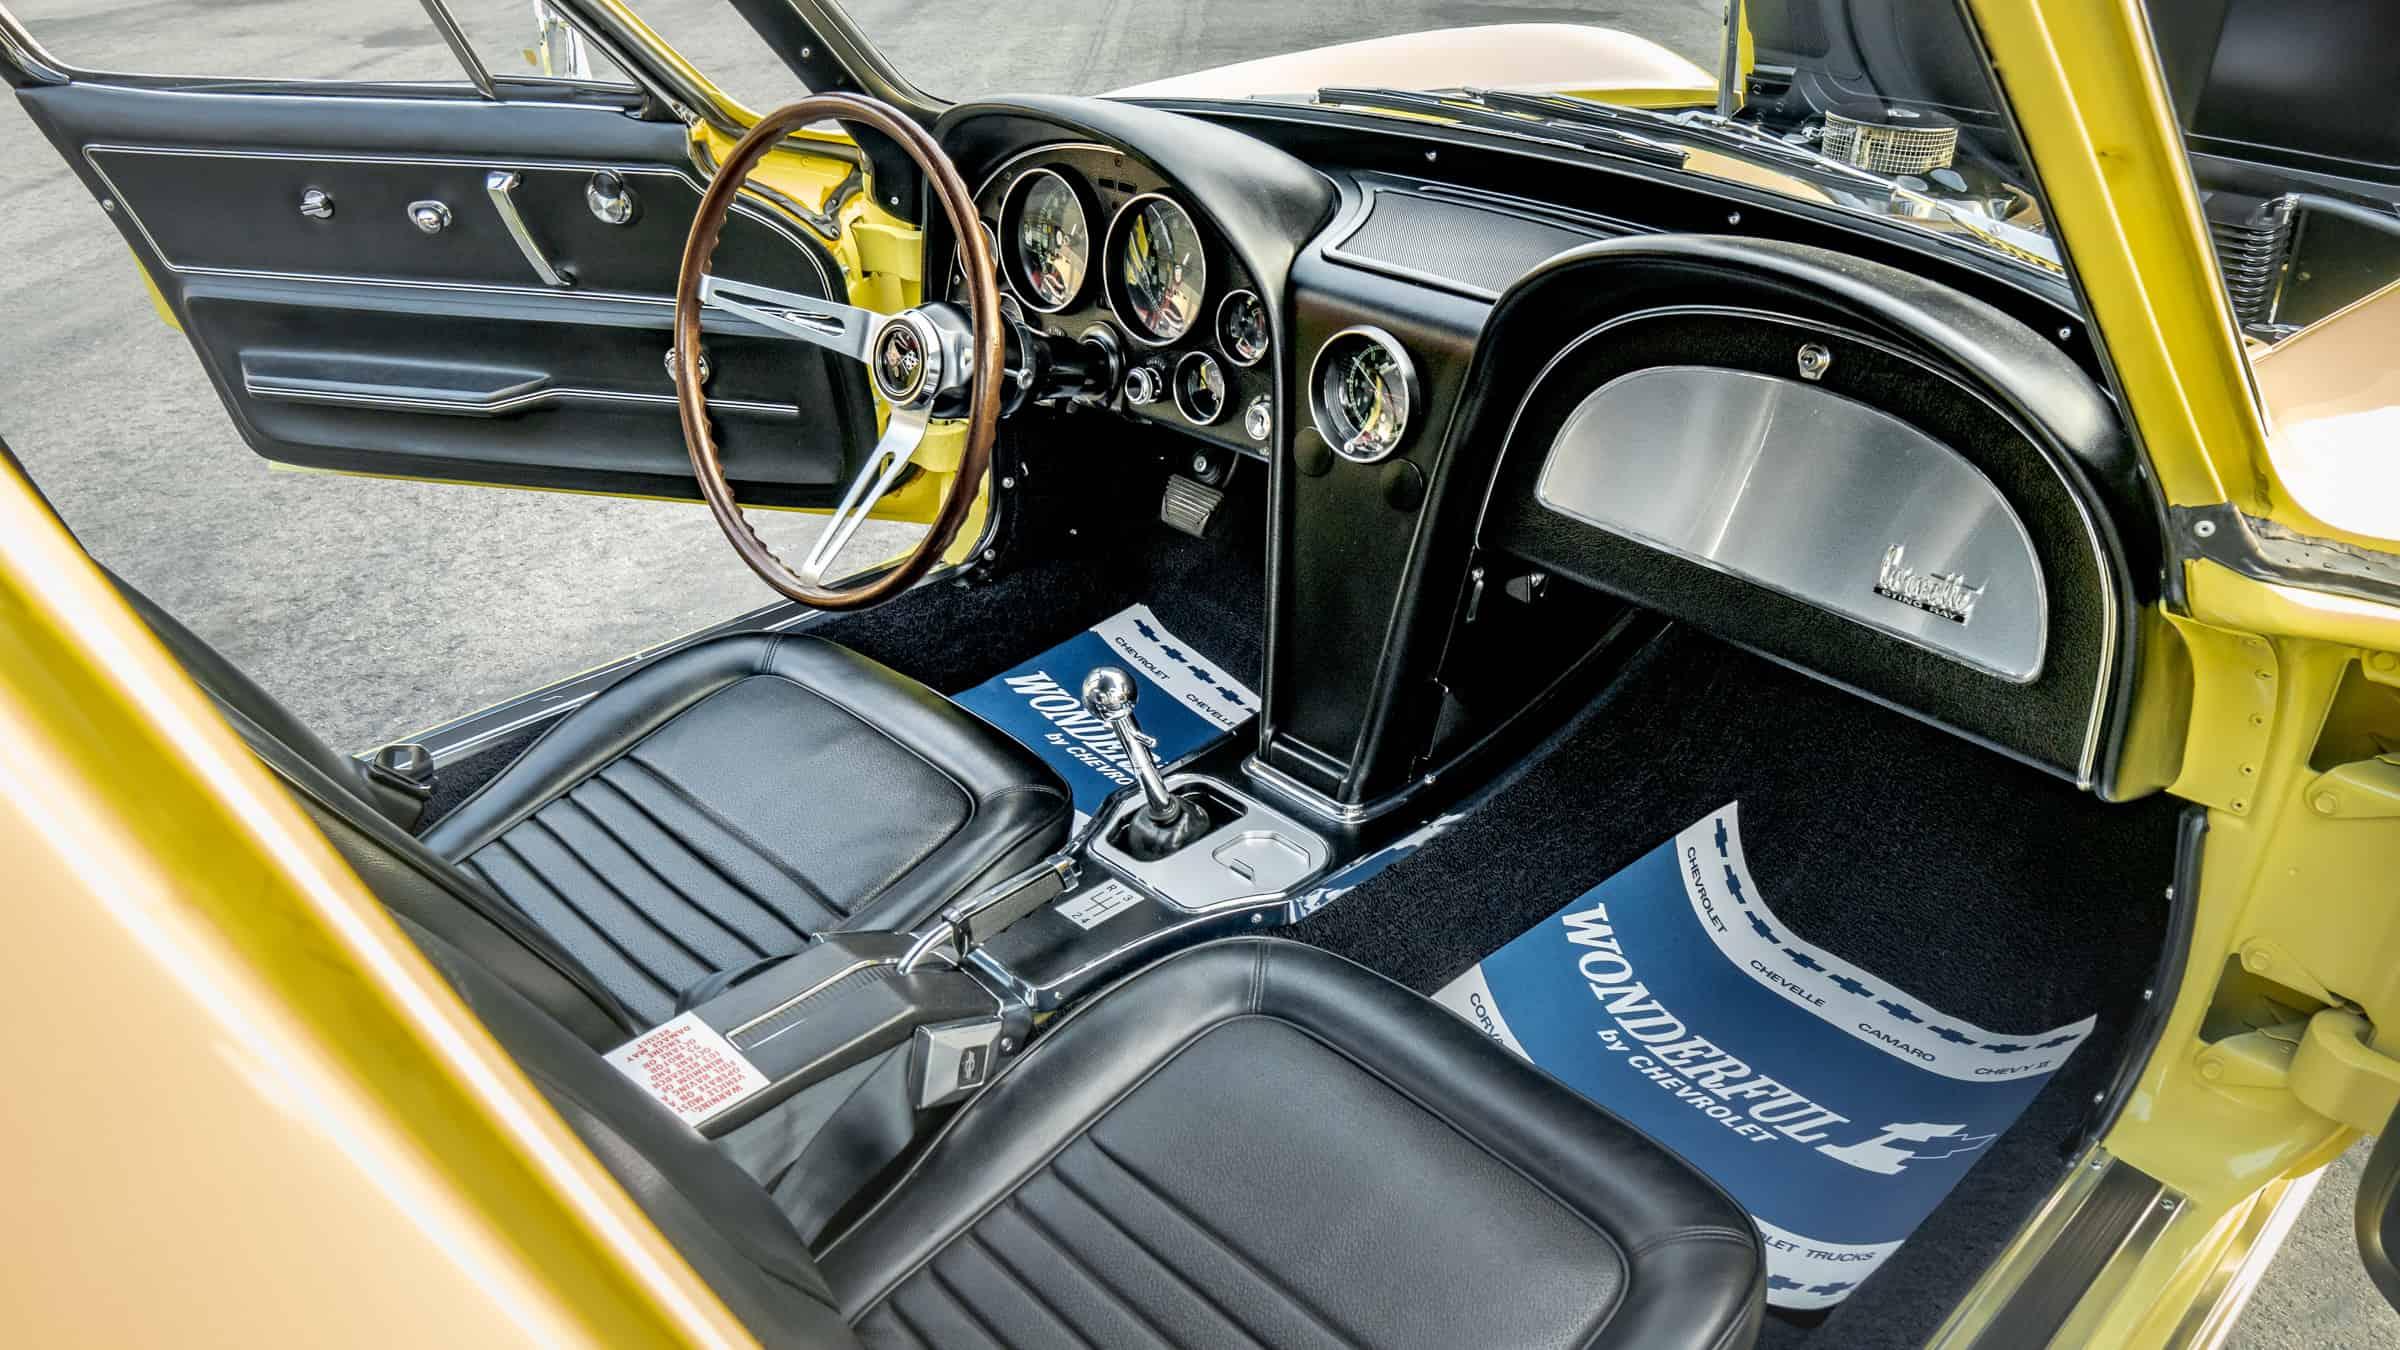 L88 Corvette, Last 1967 Corvette L88 coupe with original engine is in the market, ClassicCars.com Journal